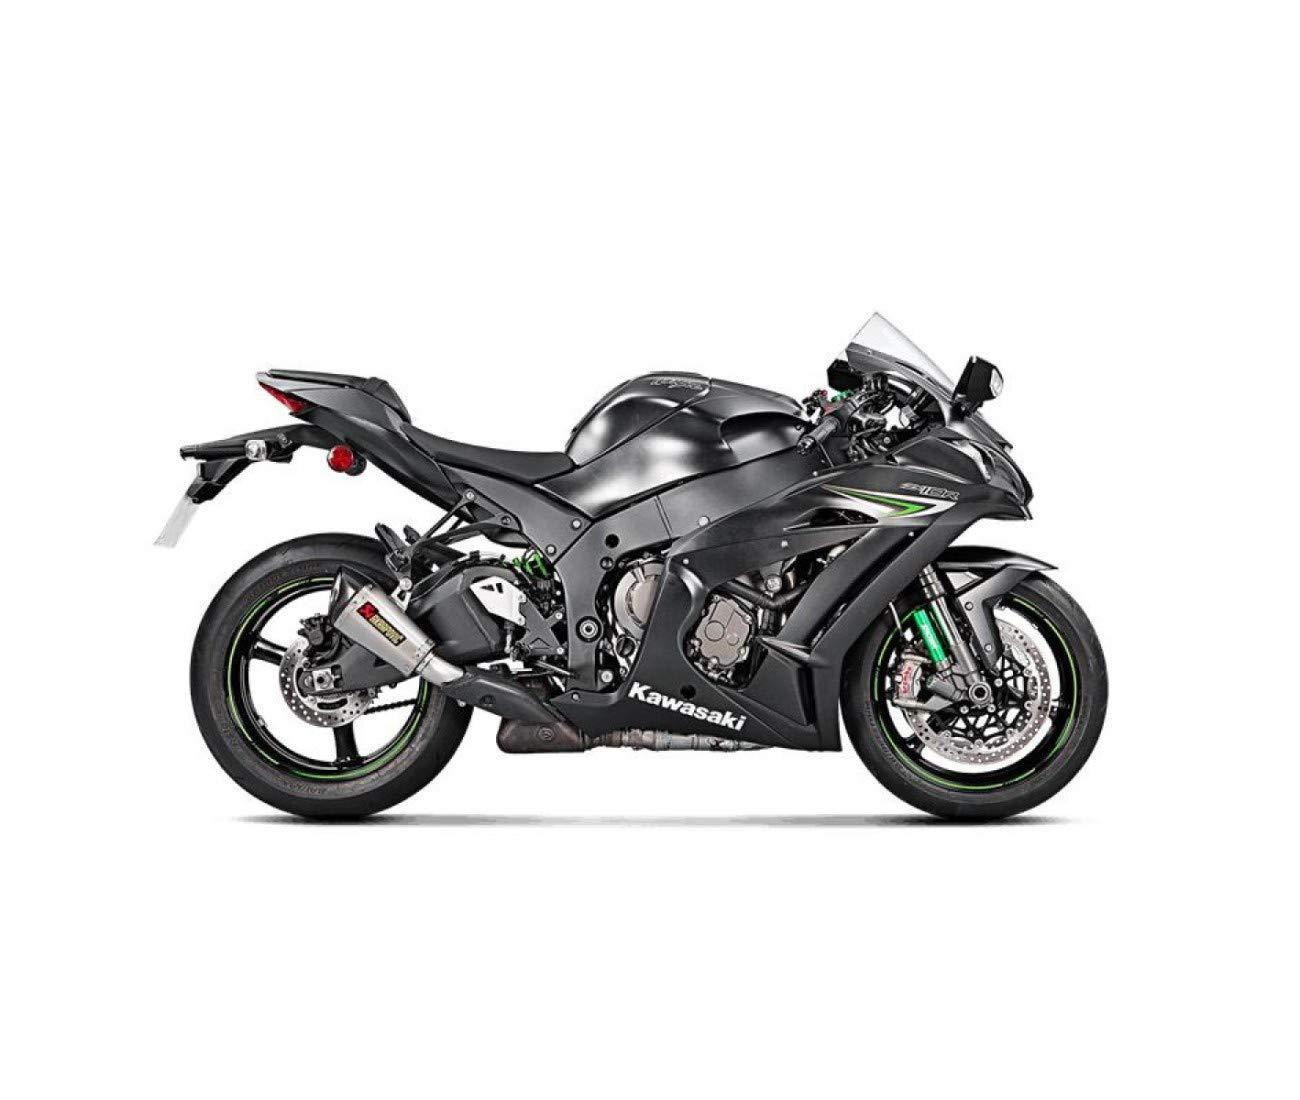 Amazon.com: Kawasaki zx10r-16/17-silencieux titanio ...